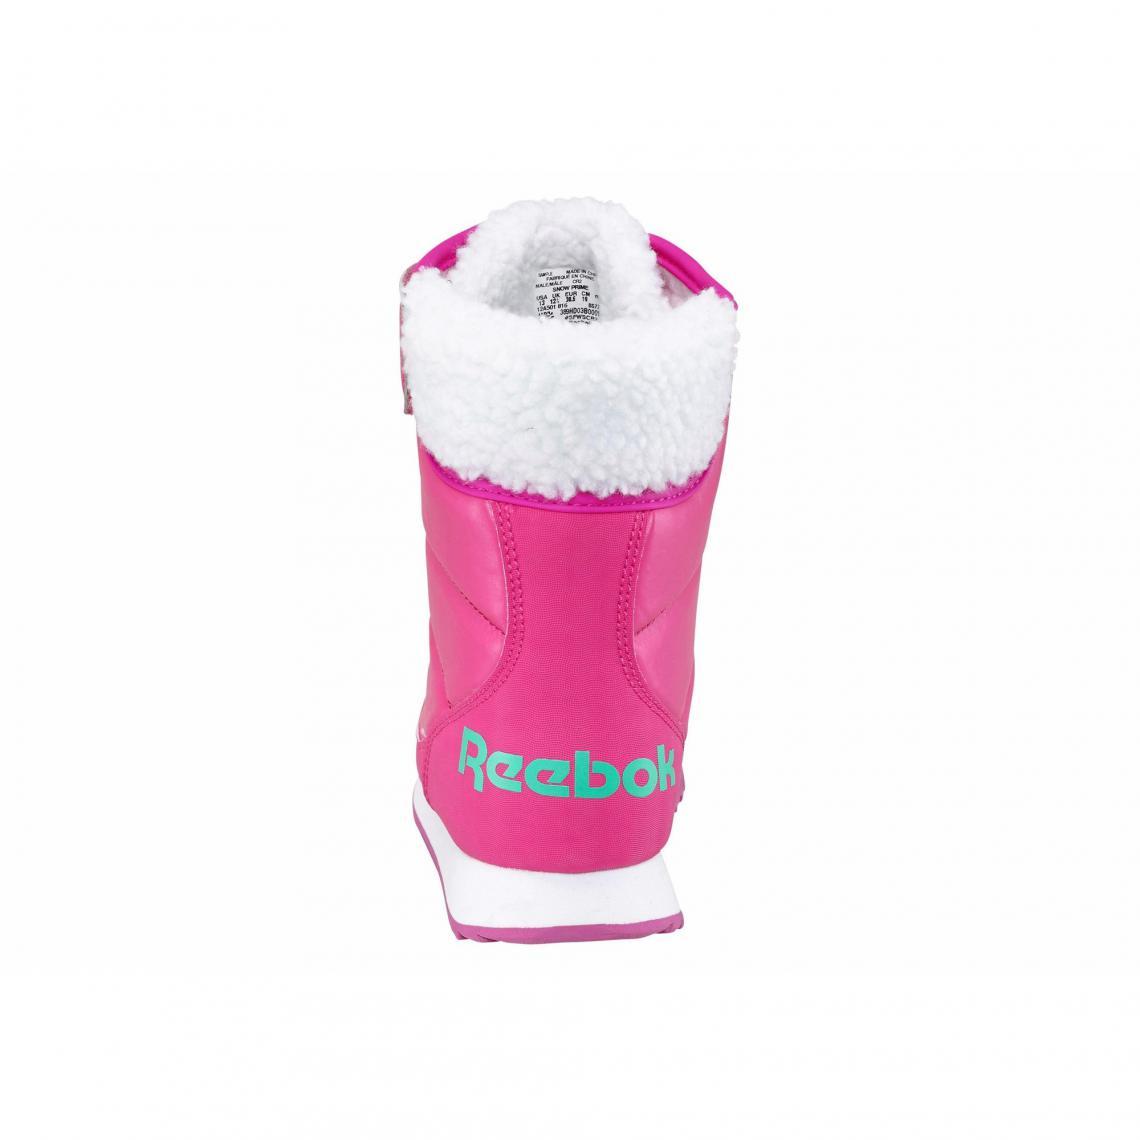 fille Bottes Prime Reebok neige Snow de Print Rose Vif mn0wN8Ov